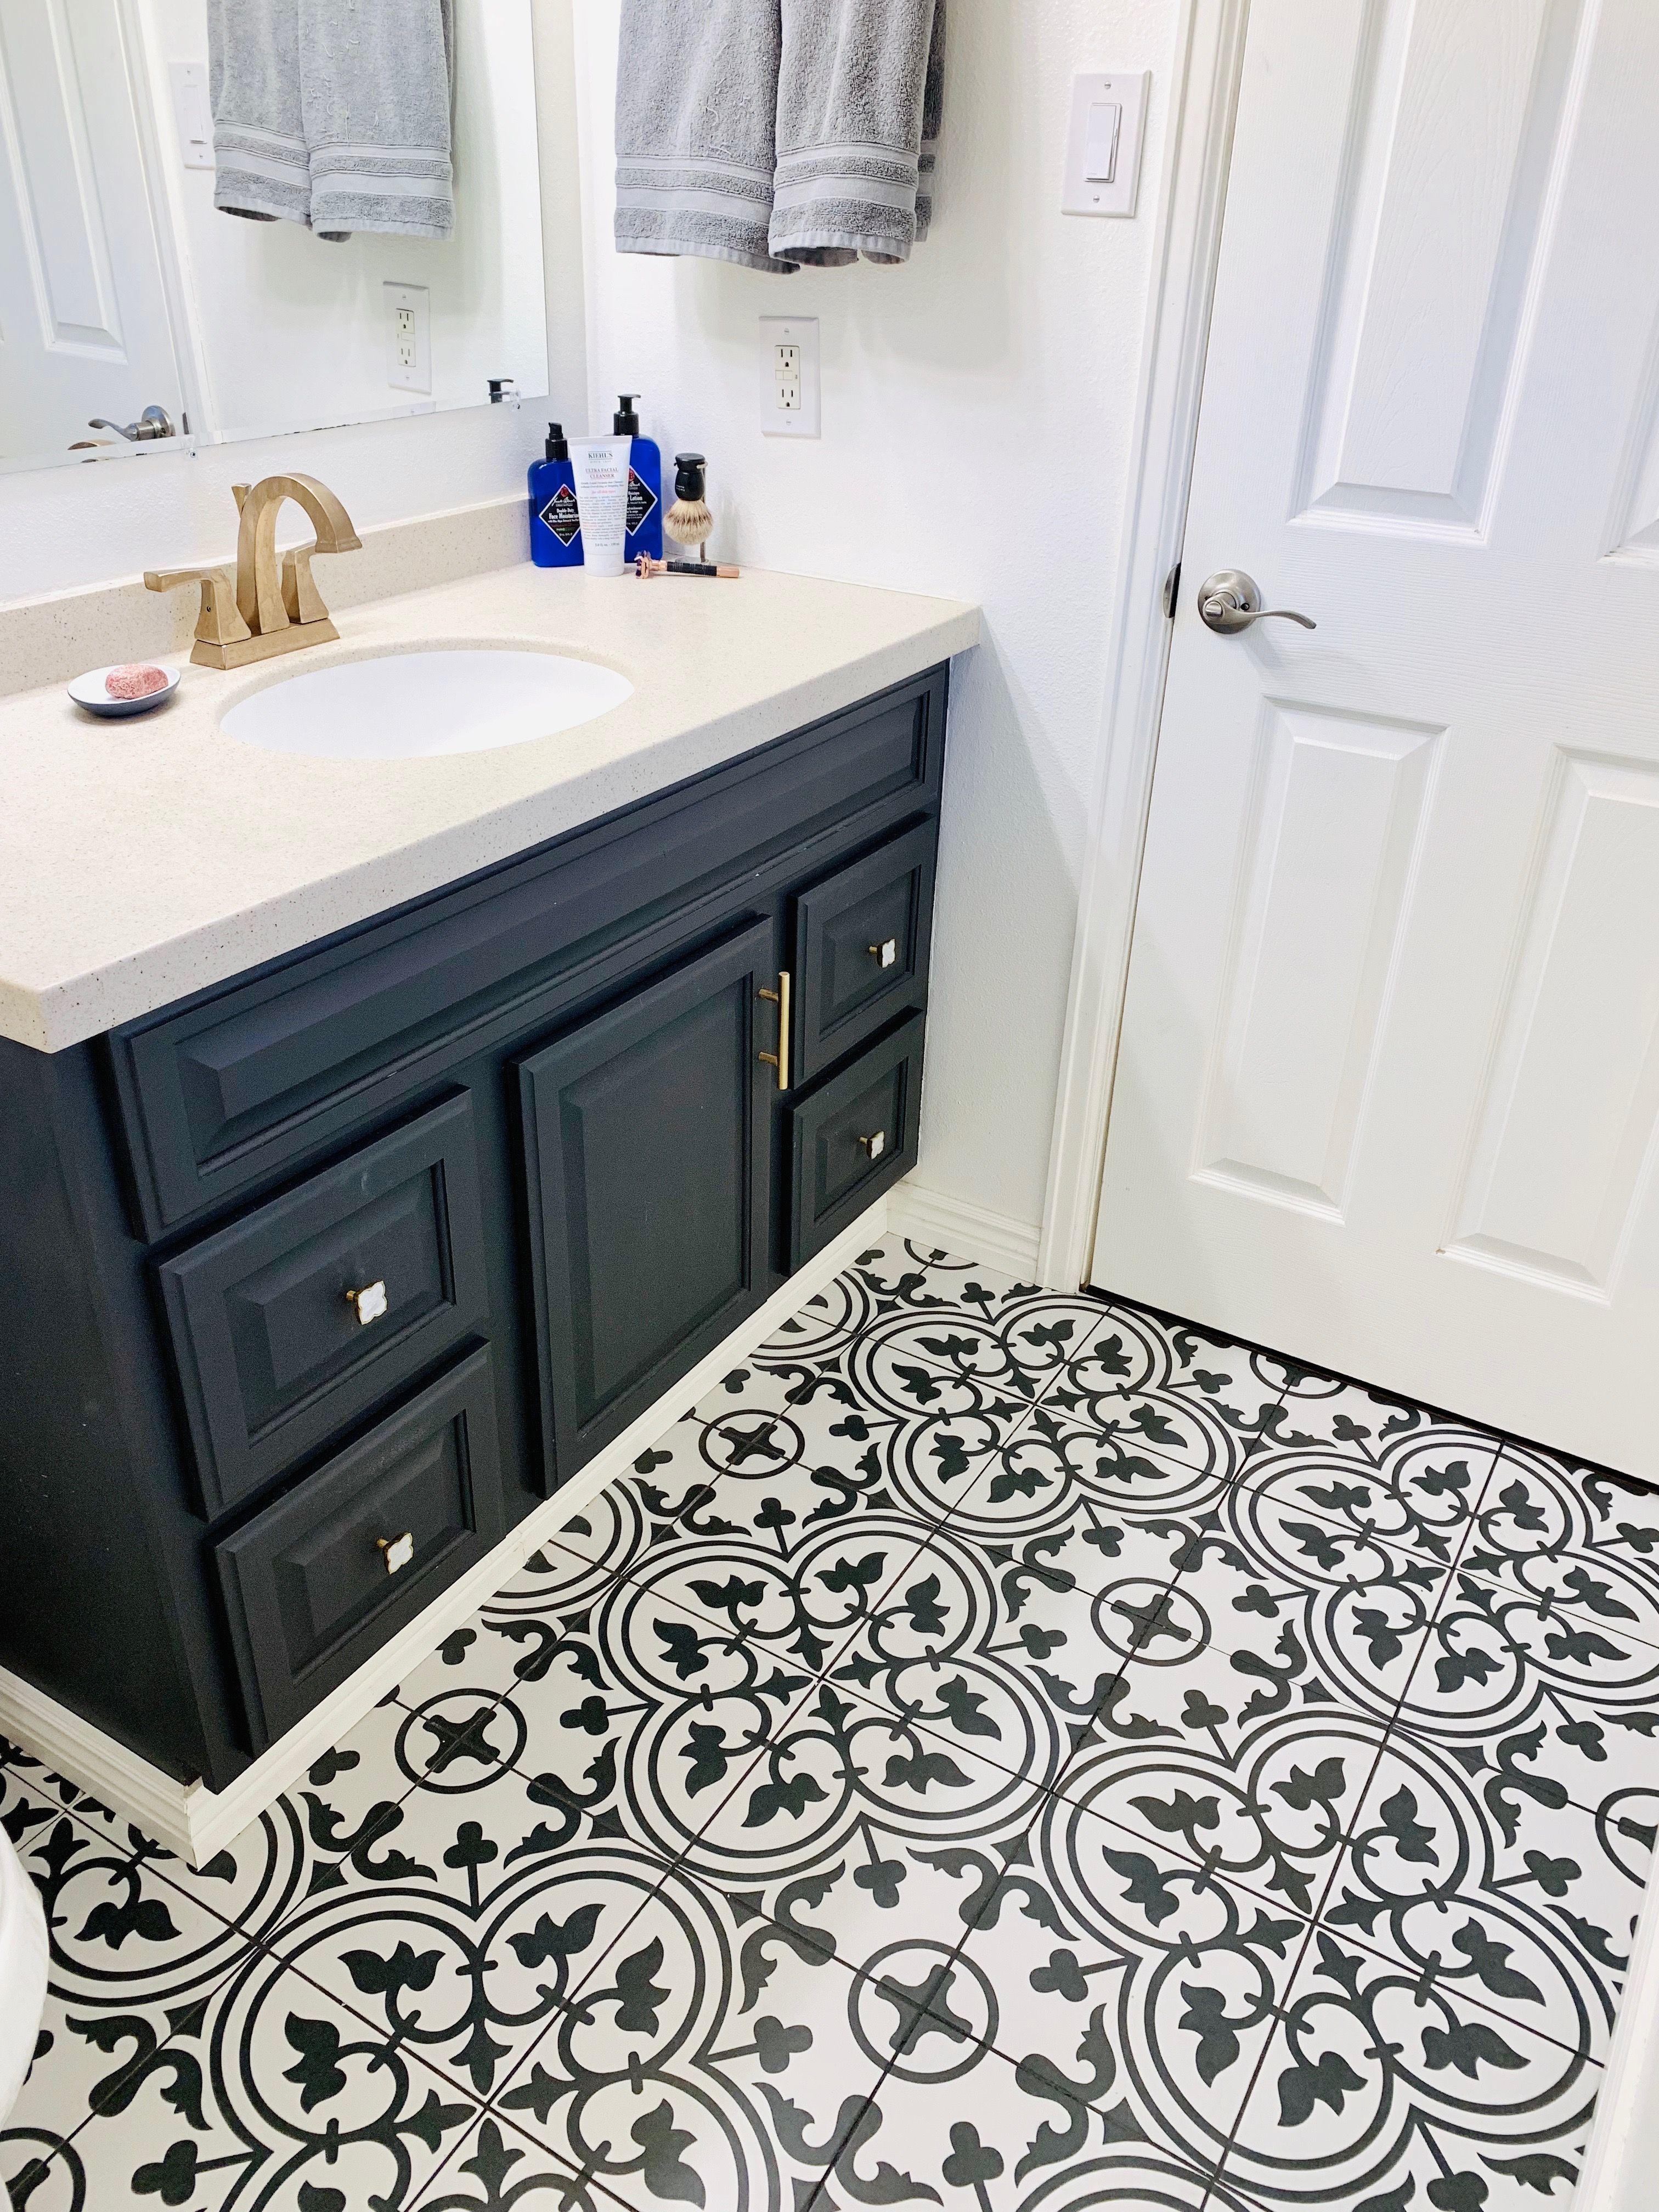 Black Bathroom Taps Blackhexagontilebathroom Bathroom Tile Renovation Painted Vanity Bathroom Tile Bathroom Black and white bathroom floor tile